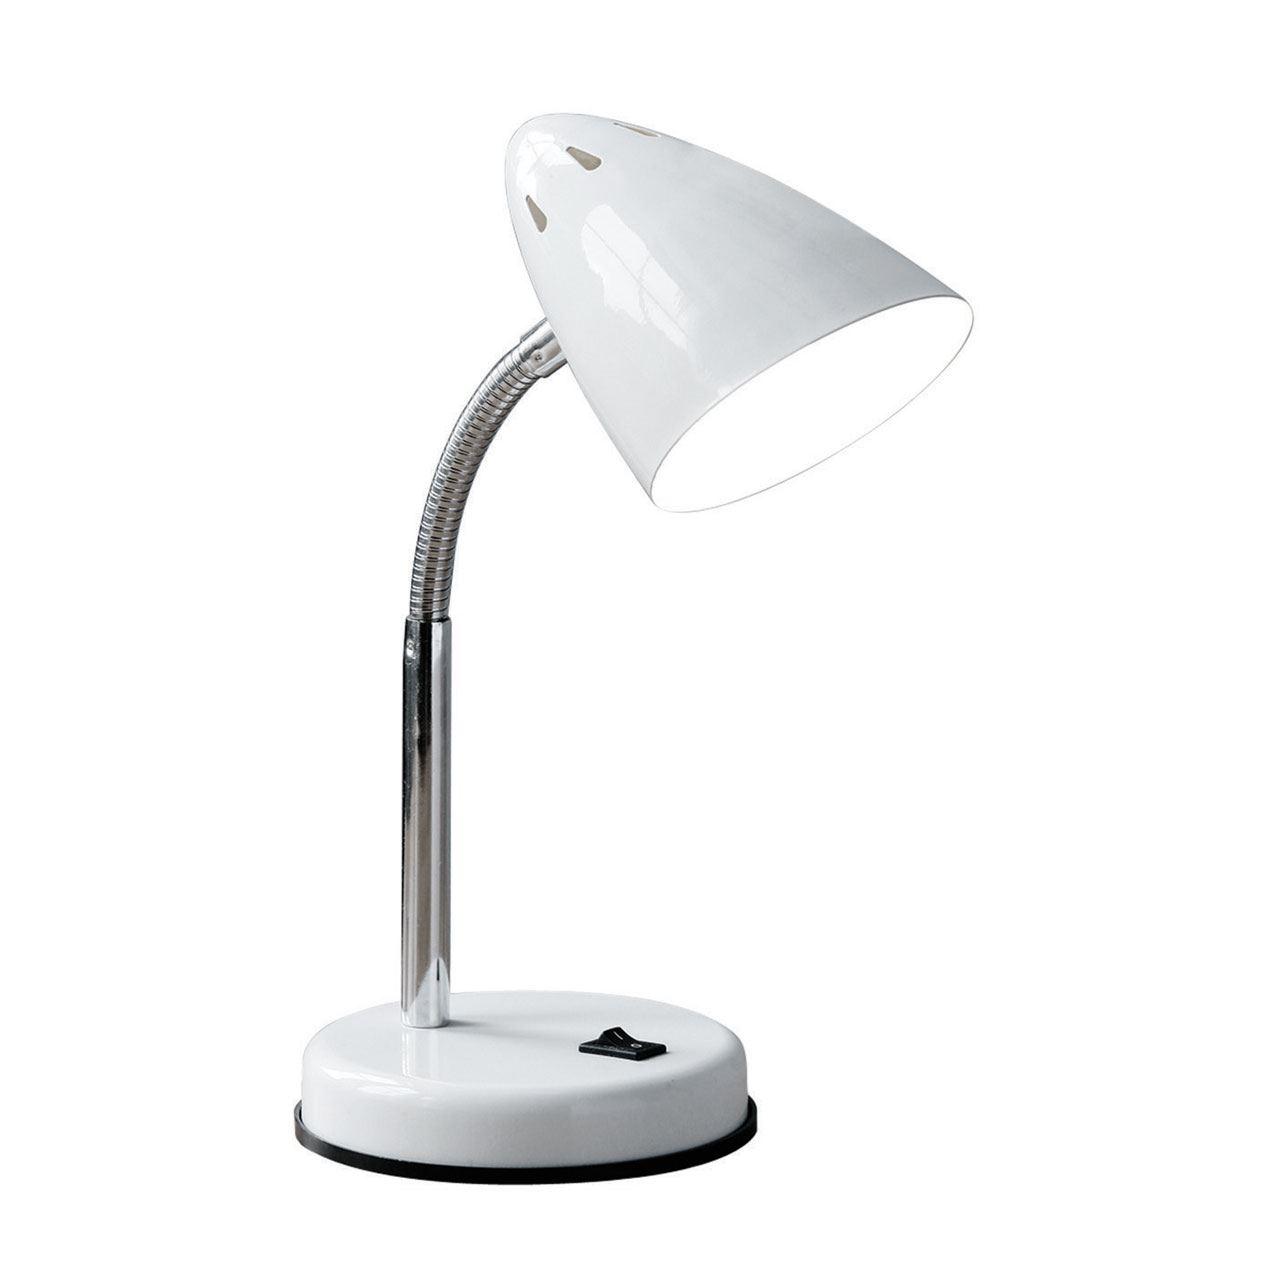 Flexi Desk Lamp (Plug), White Metal, Chrome